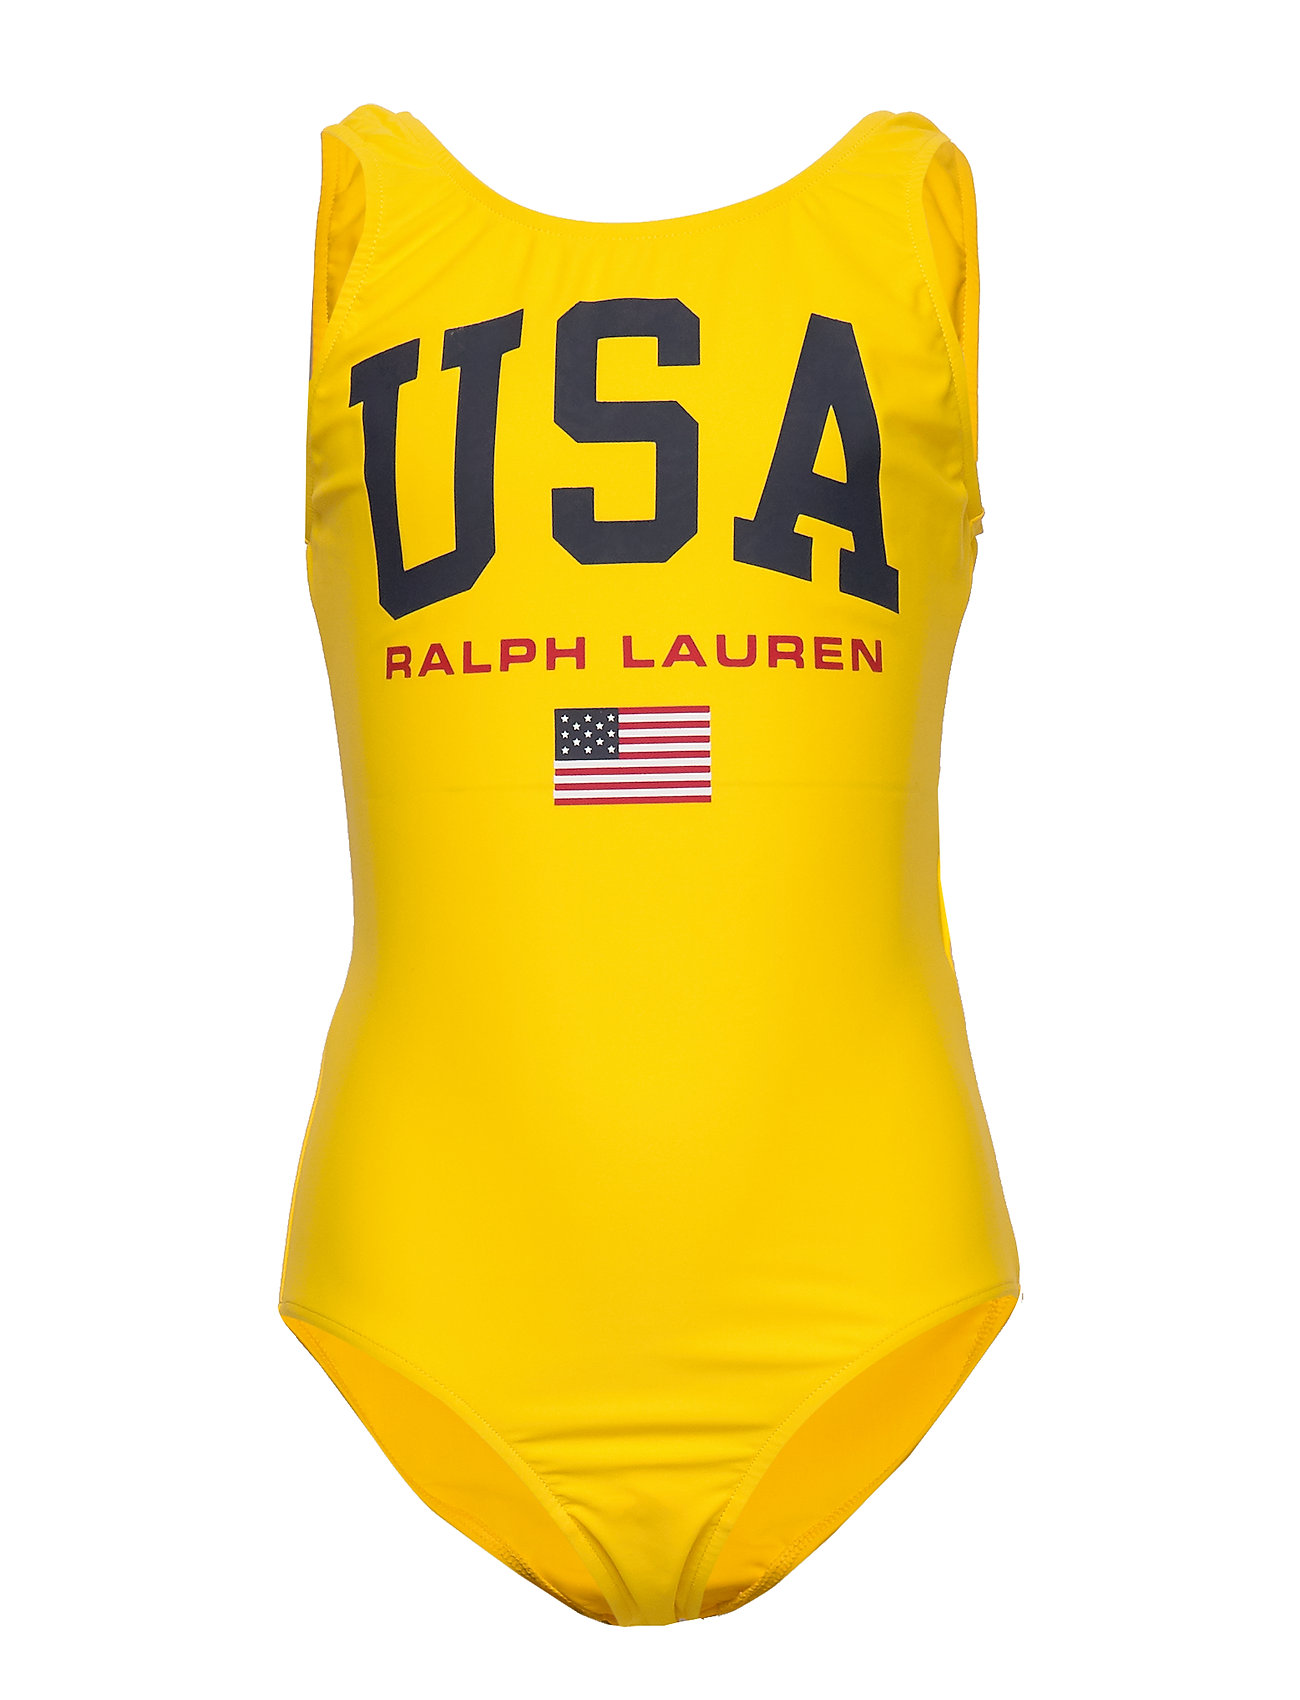 Ralph Lauren Kids USA One-Piece Swimsuit - LEMON RIND